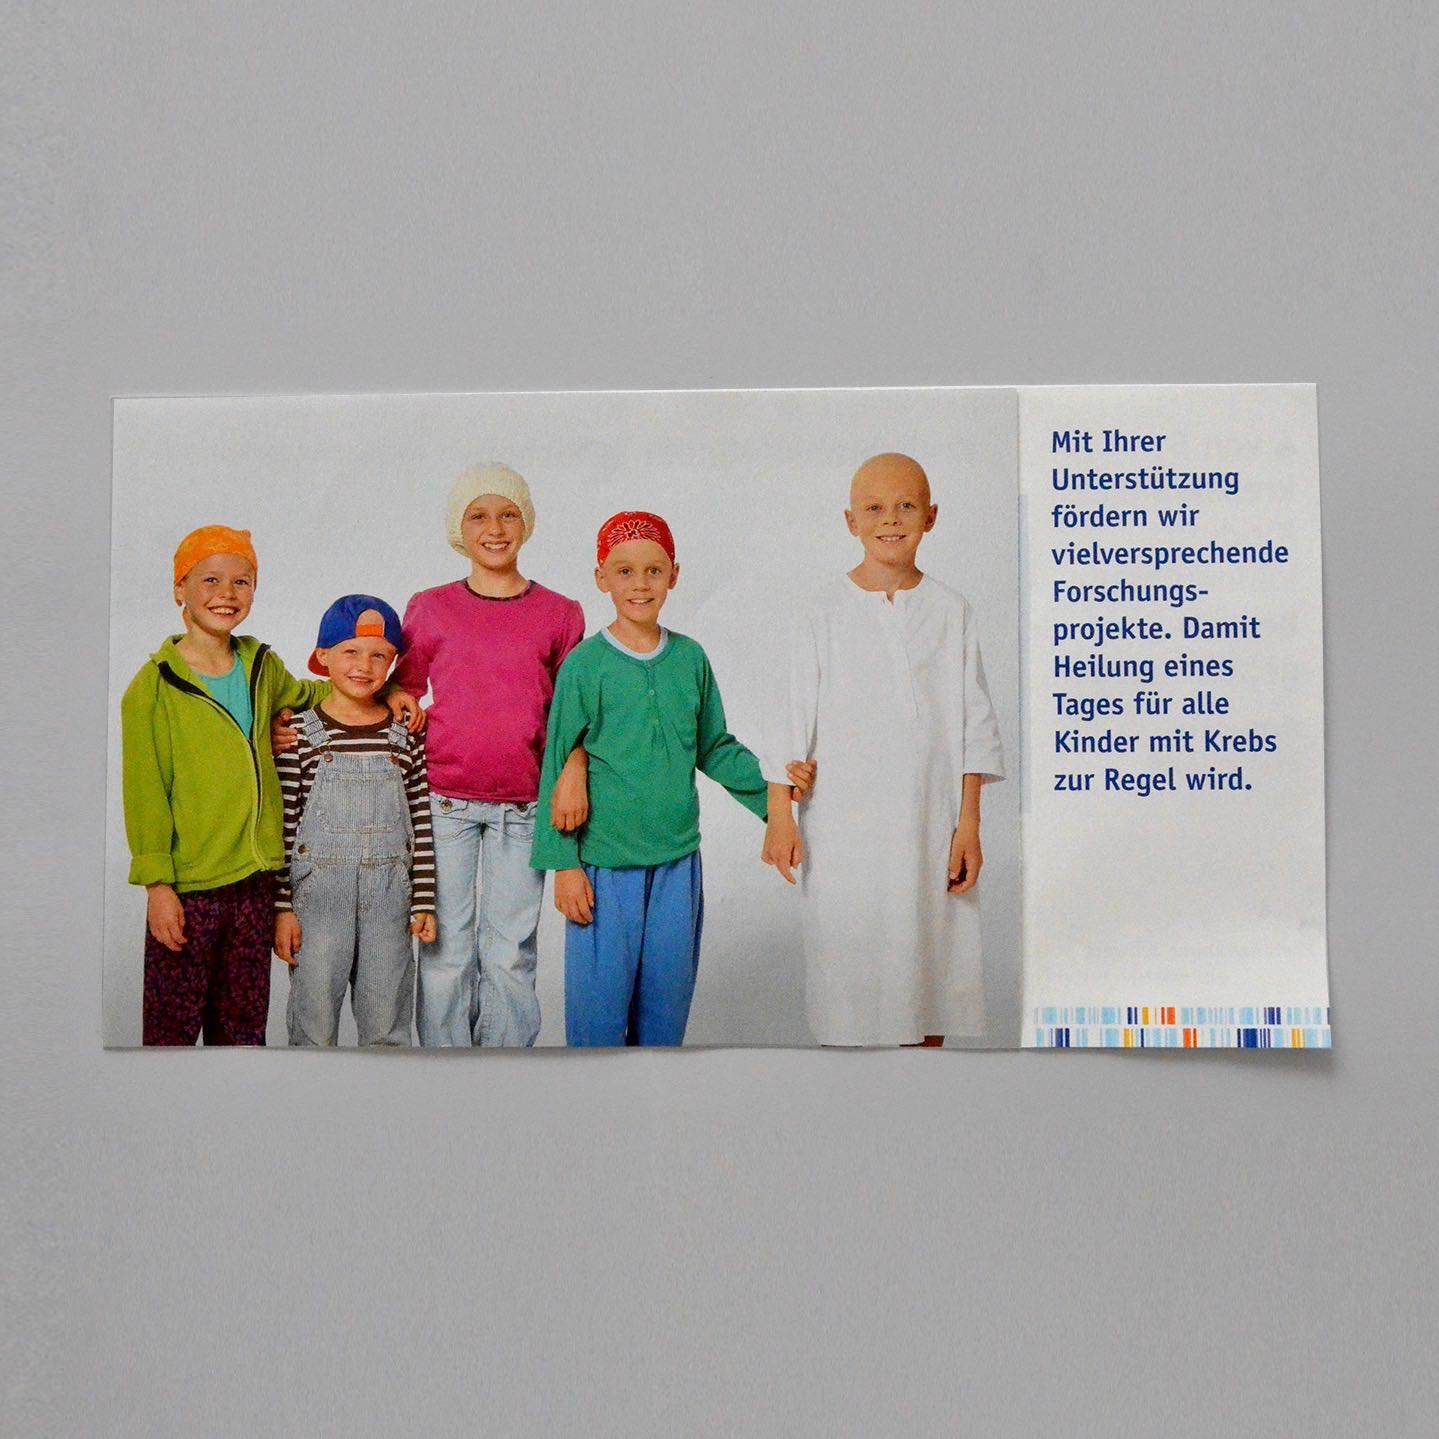 Copy of Krebsforschung Schweiz: Beilage geöffnetSpendermailing November 2017